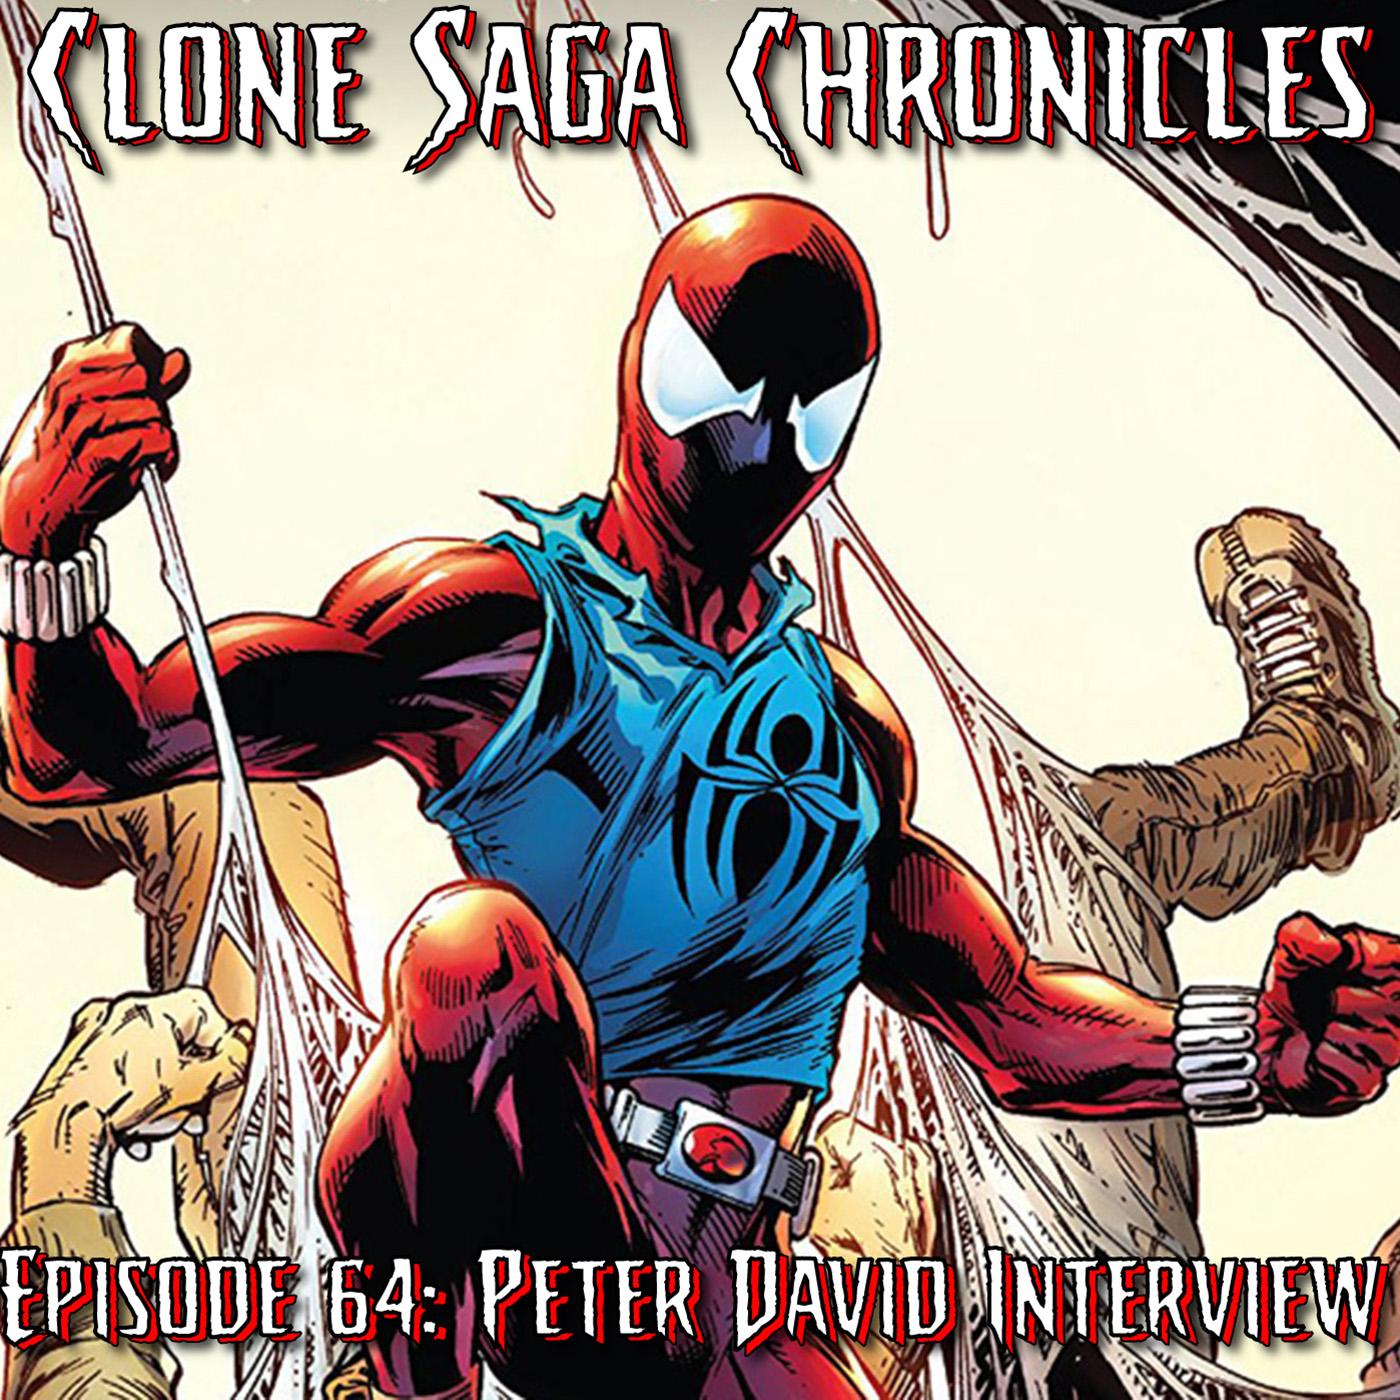 CSC Episode 64: Peter David Interview